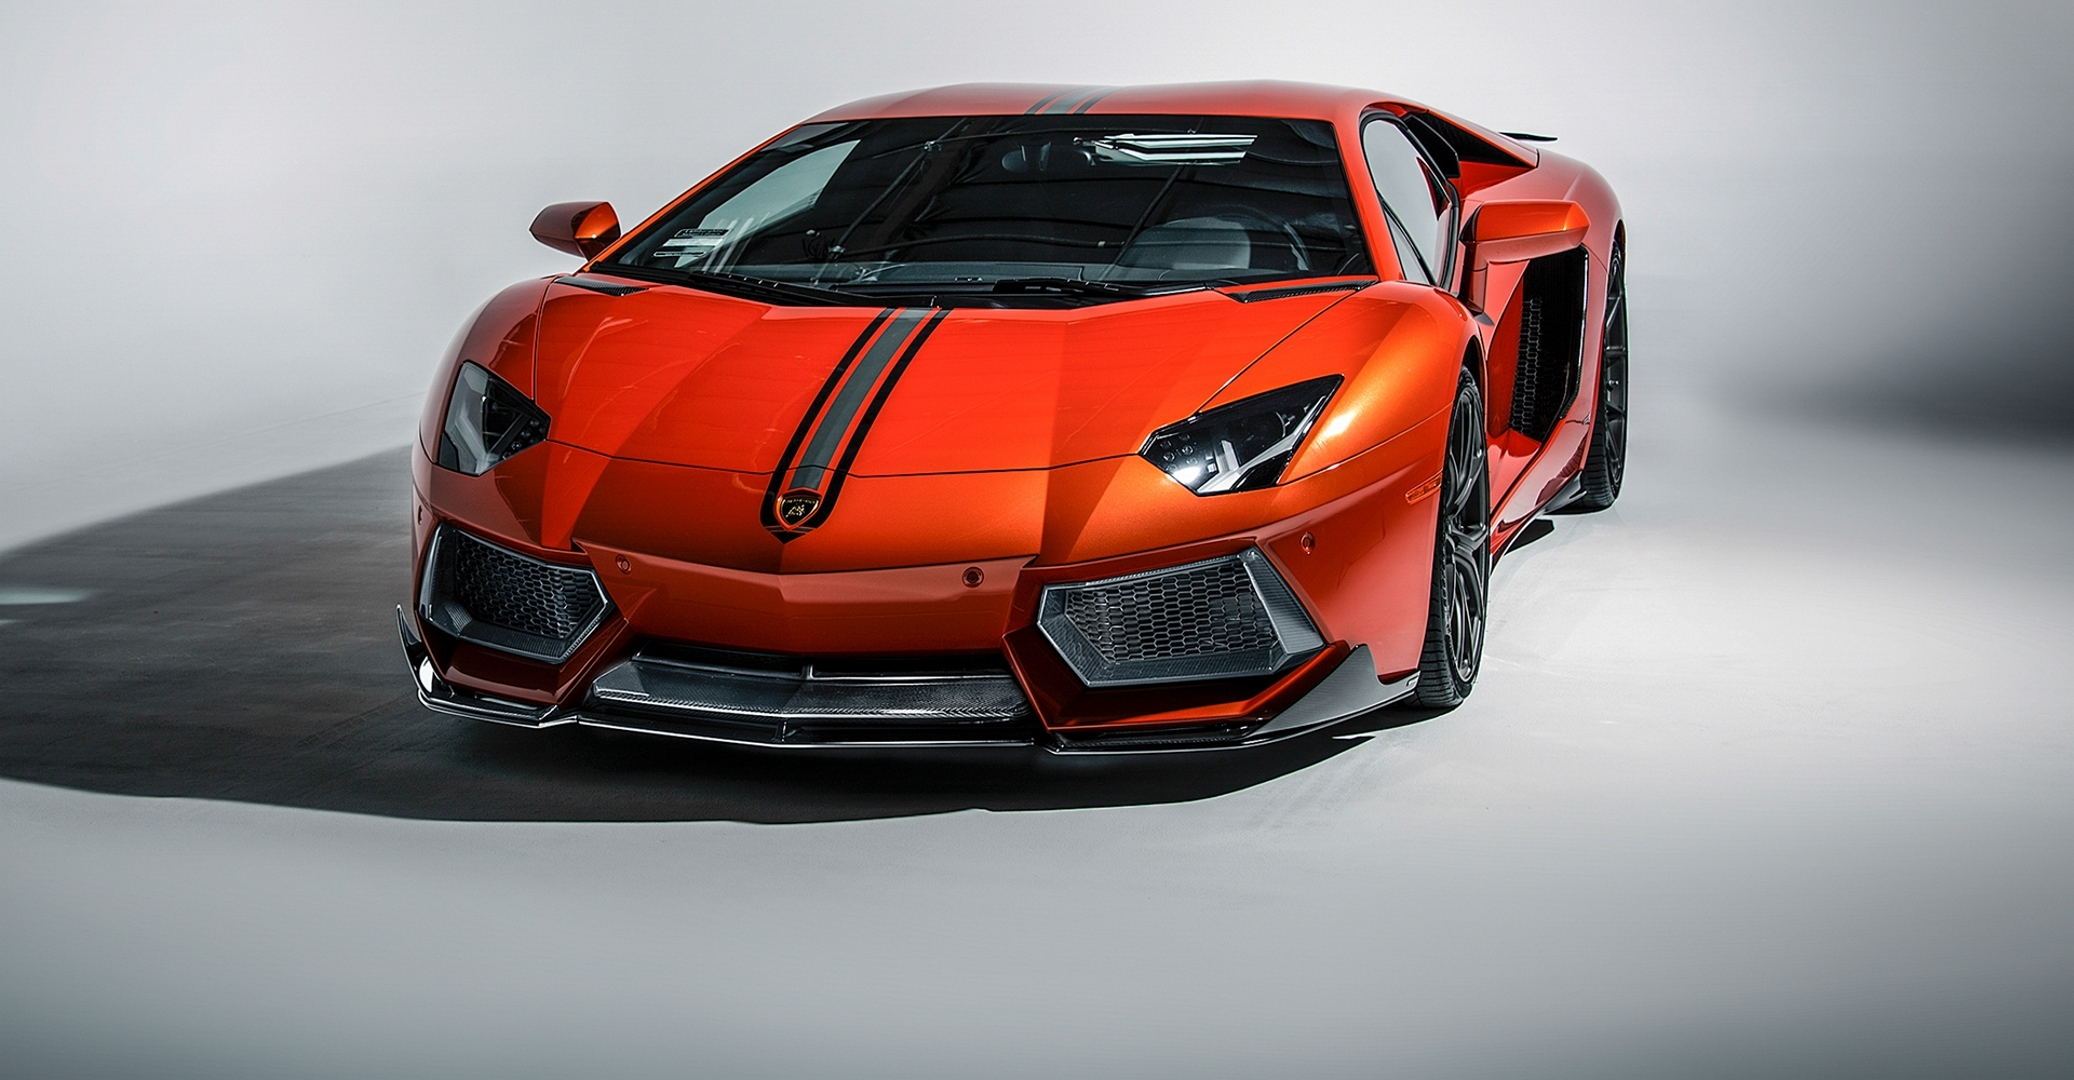 Lamborghini Aventador Lp 700 4 Wallpapers Pictures Images